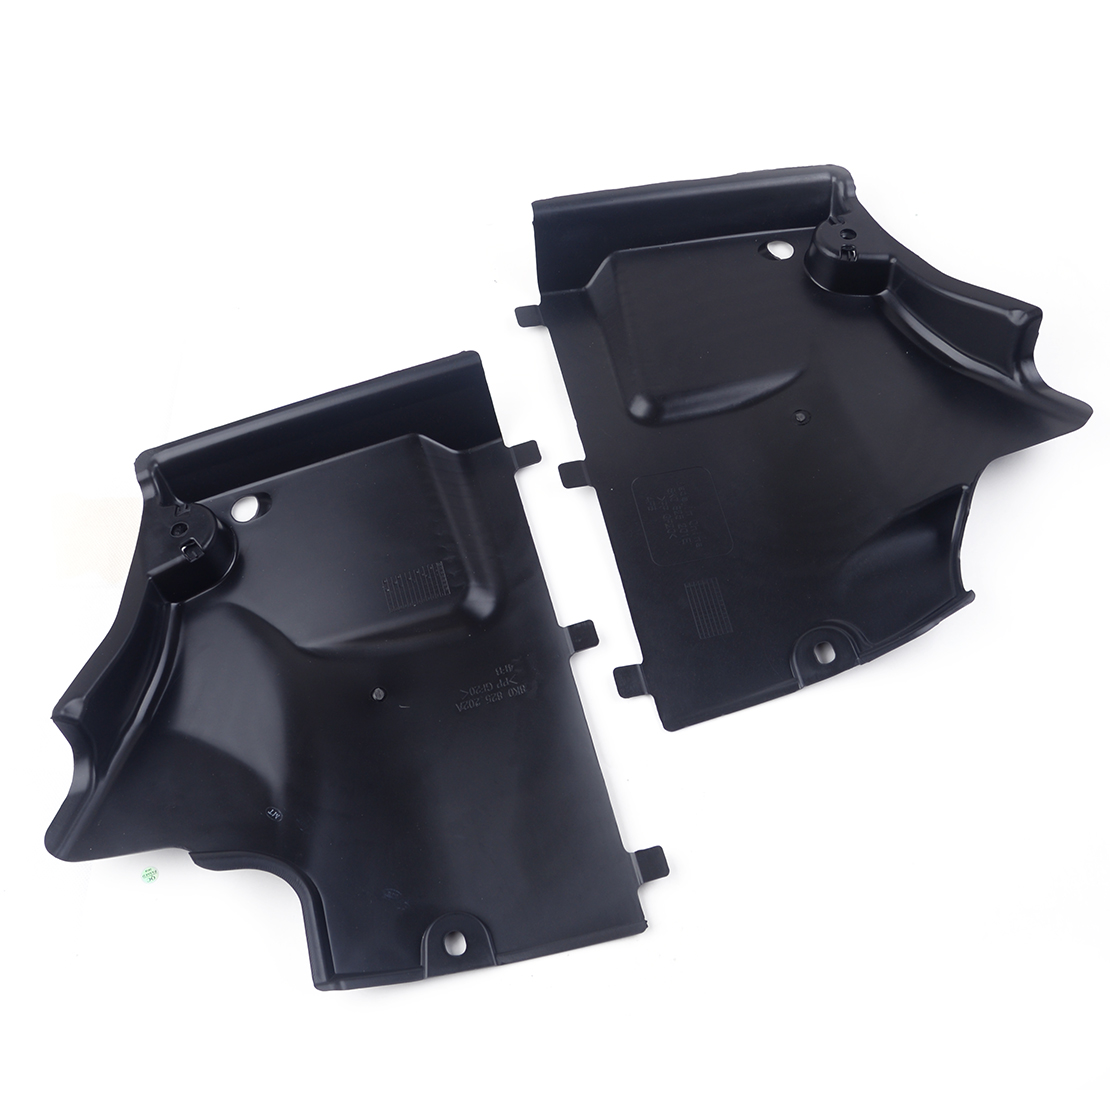 DWCX 1 Pair Black ABS Front Underbody Shield Panel Cover Trim 8K0825201E Fit for AUDI A4 S4 A5 S5 2010 2011 2012 2013 2014 2015